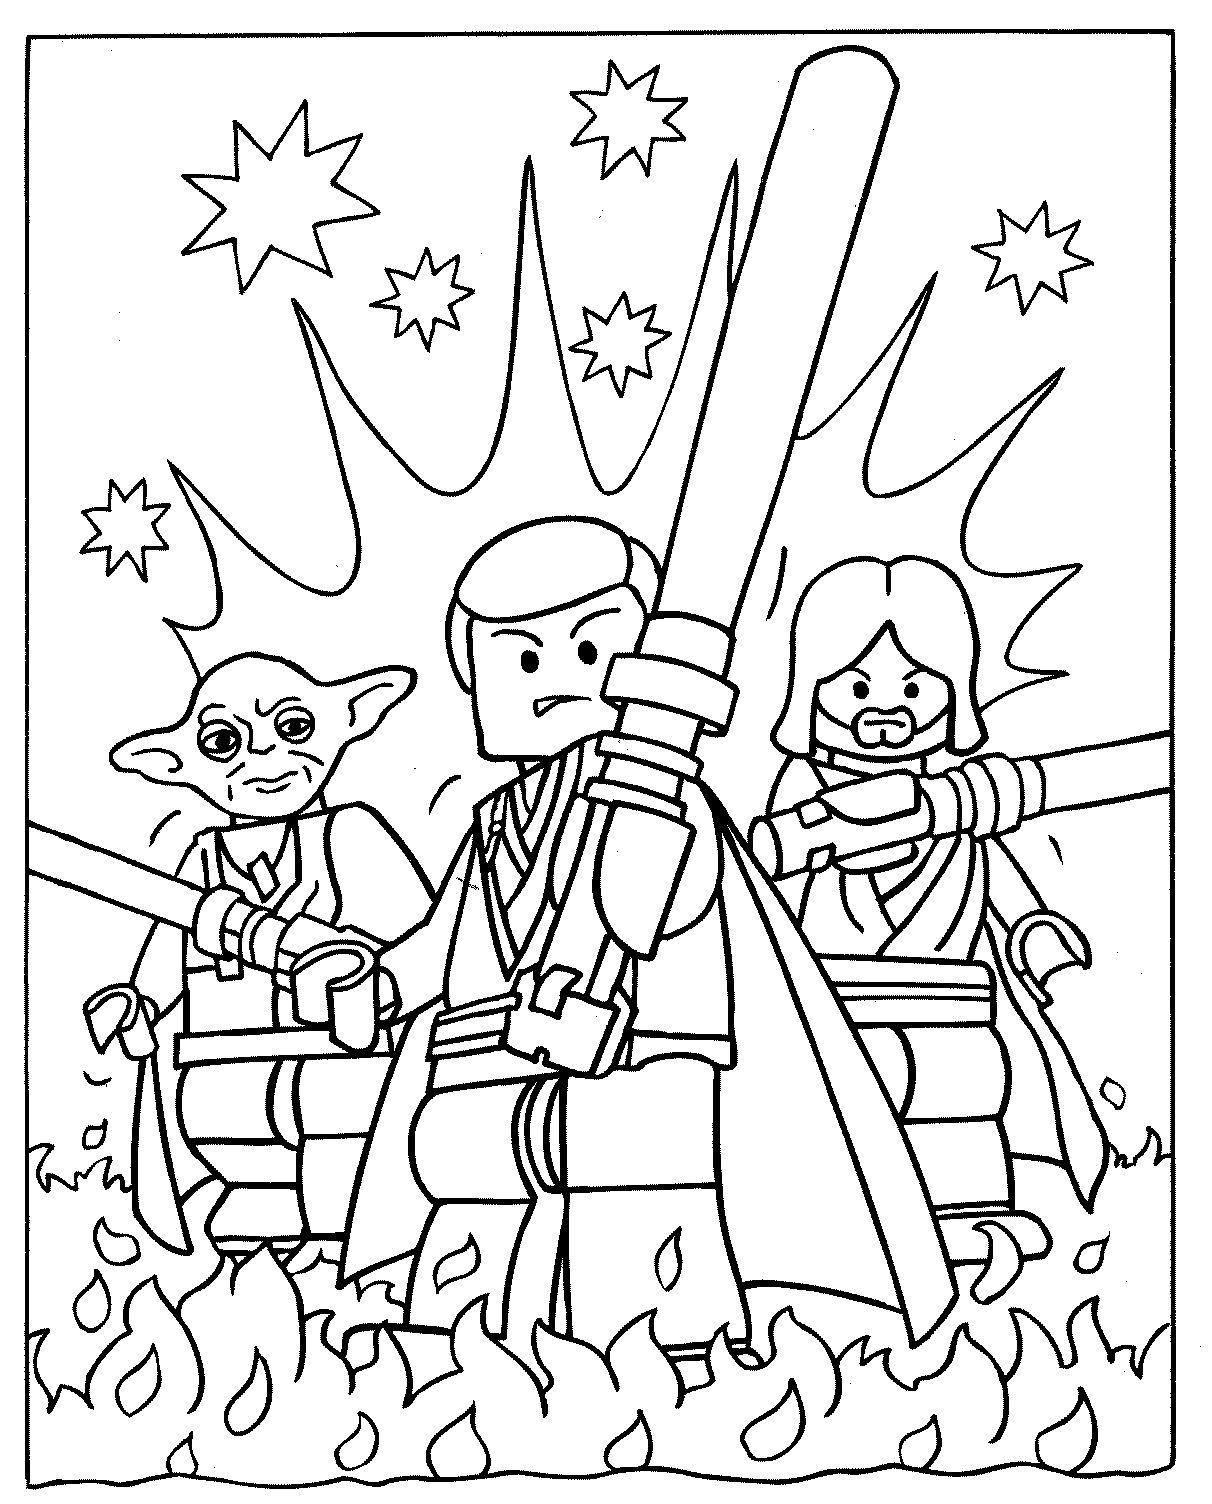 coloring star wars lego star wars coloring pages best coloring pages for kids coloring wars star